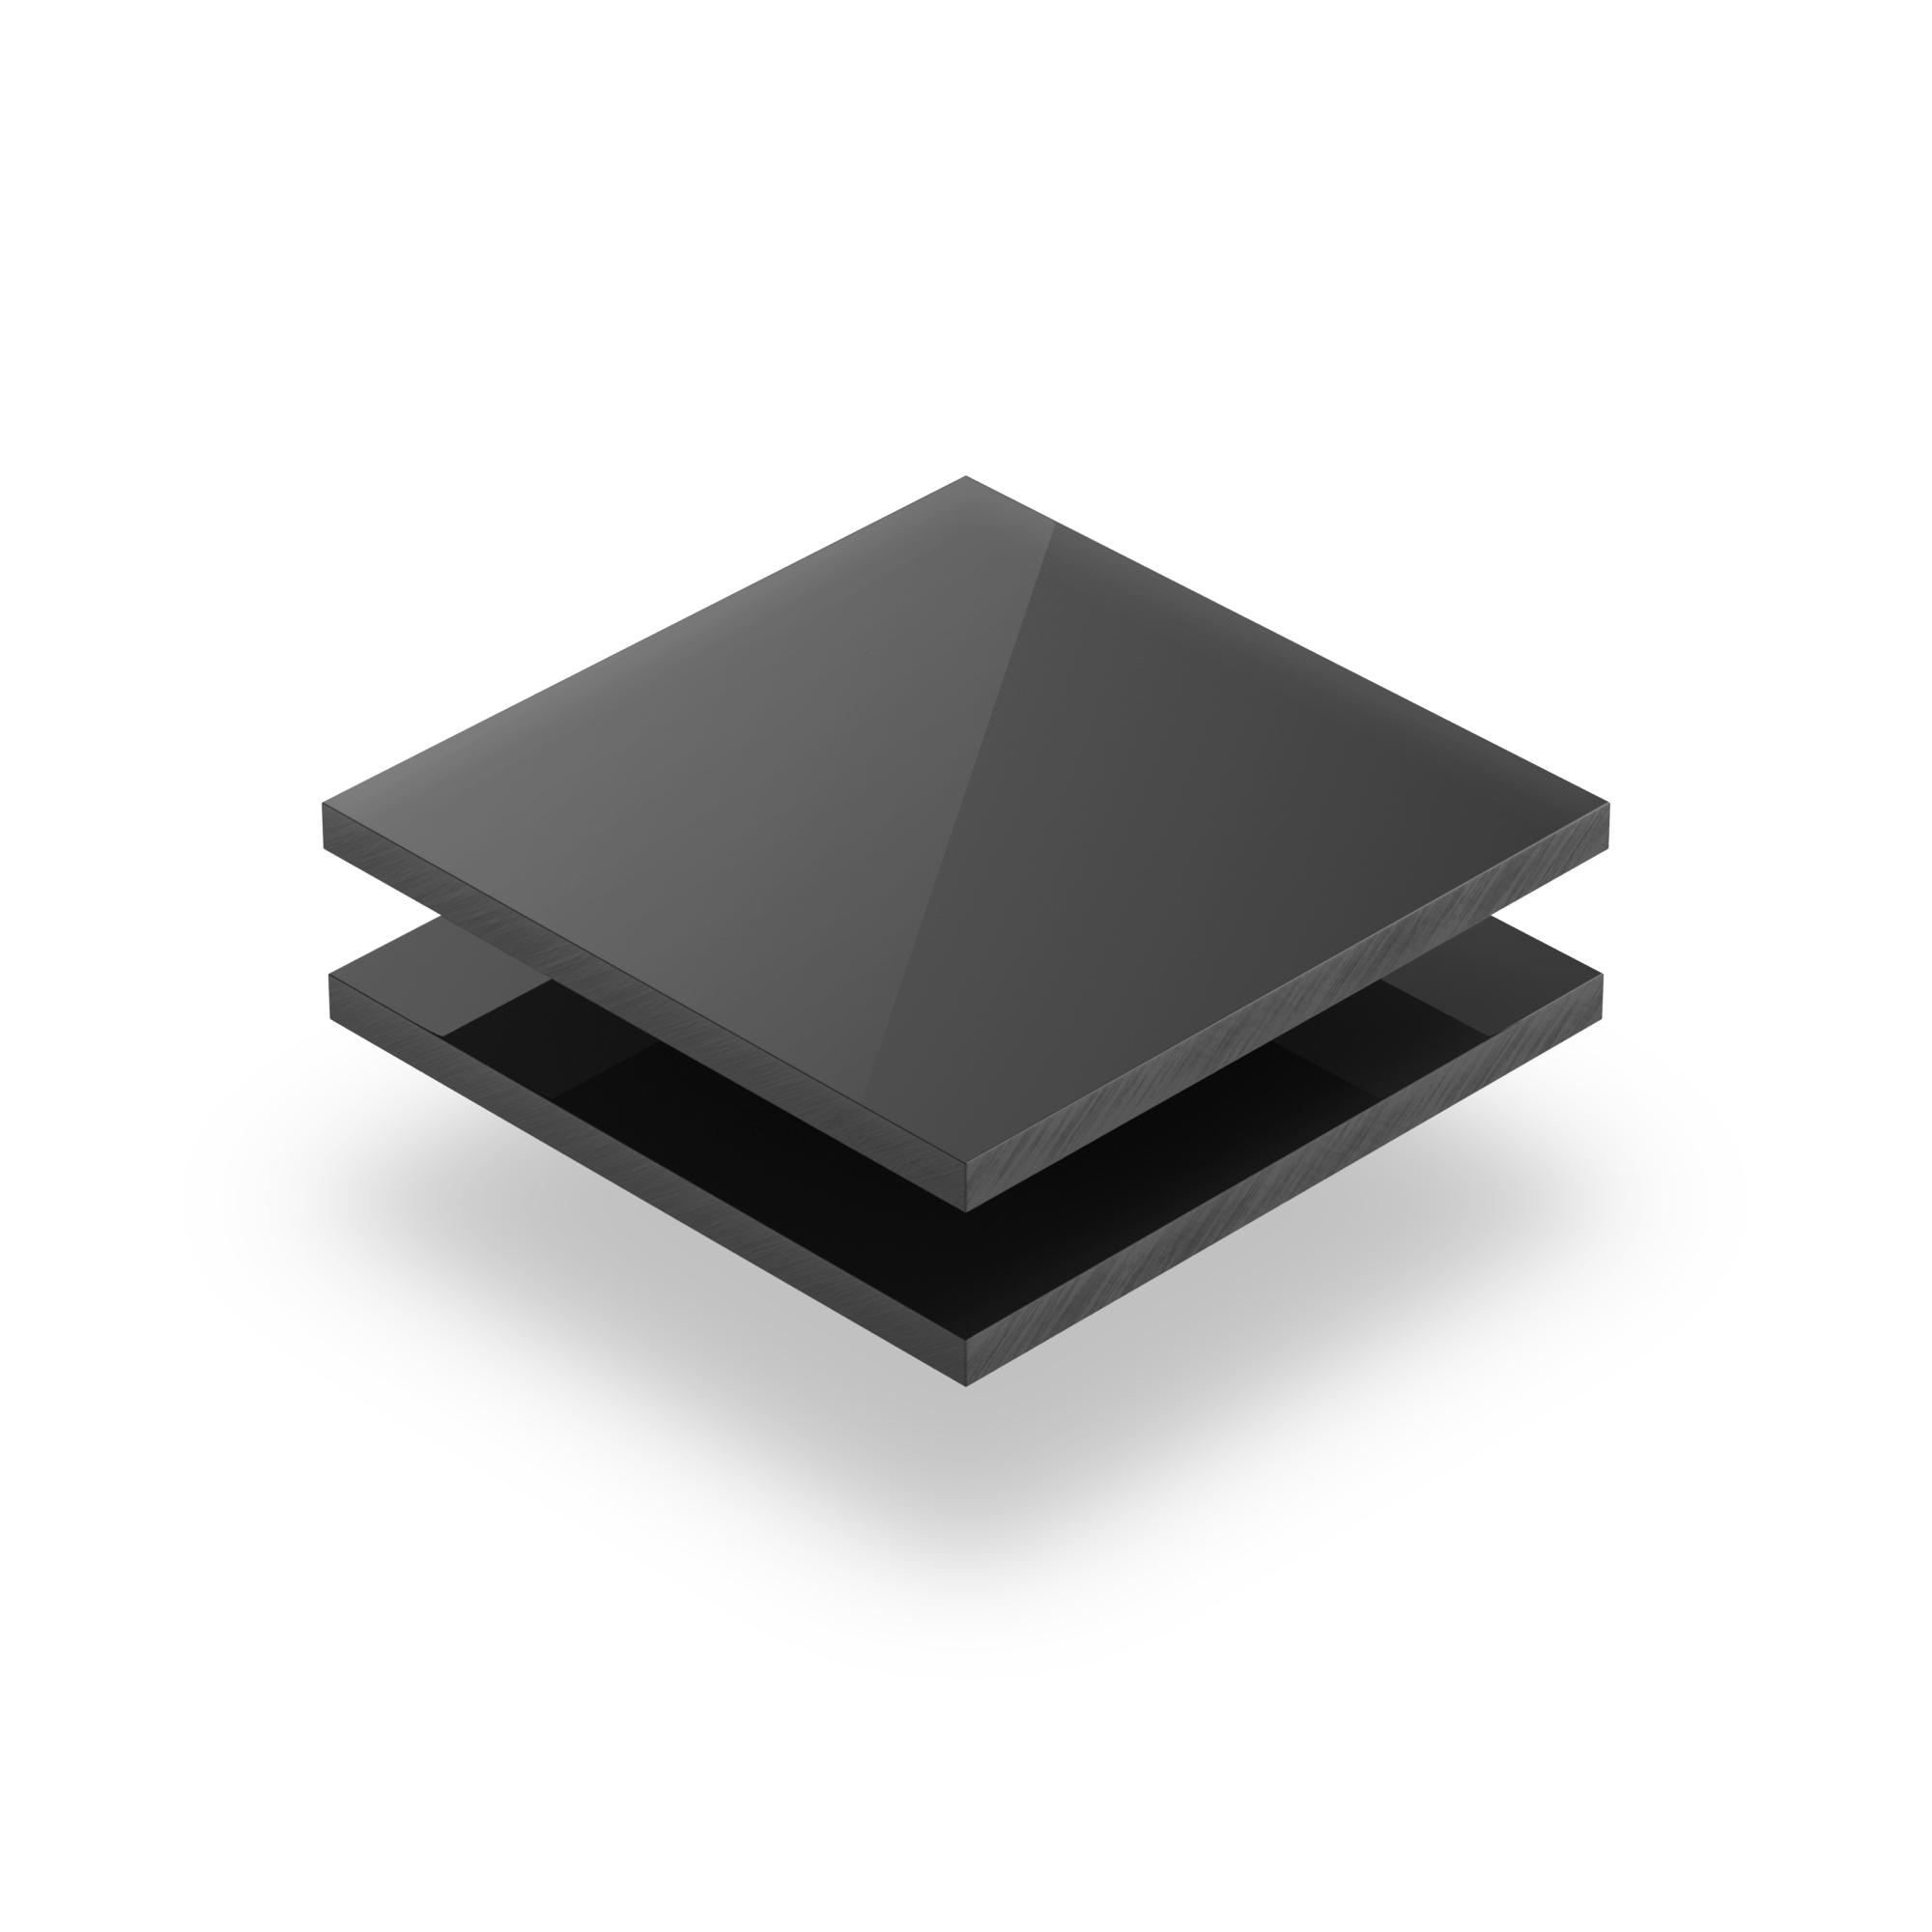 Solid Pvc Sheet 8mm Dark Grey Plasticsheetsshop Co Uk